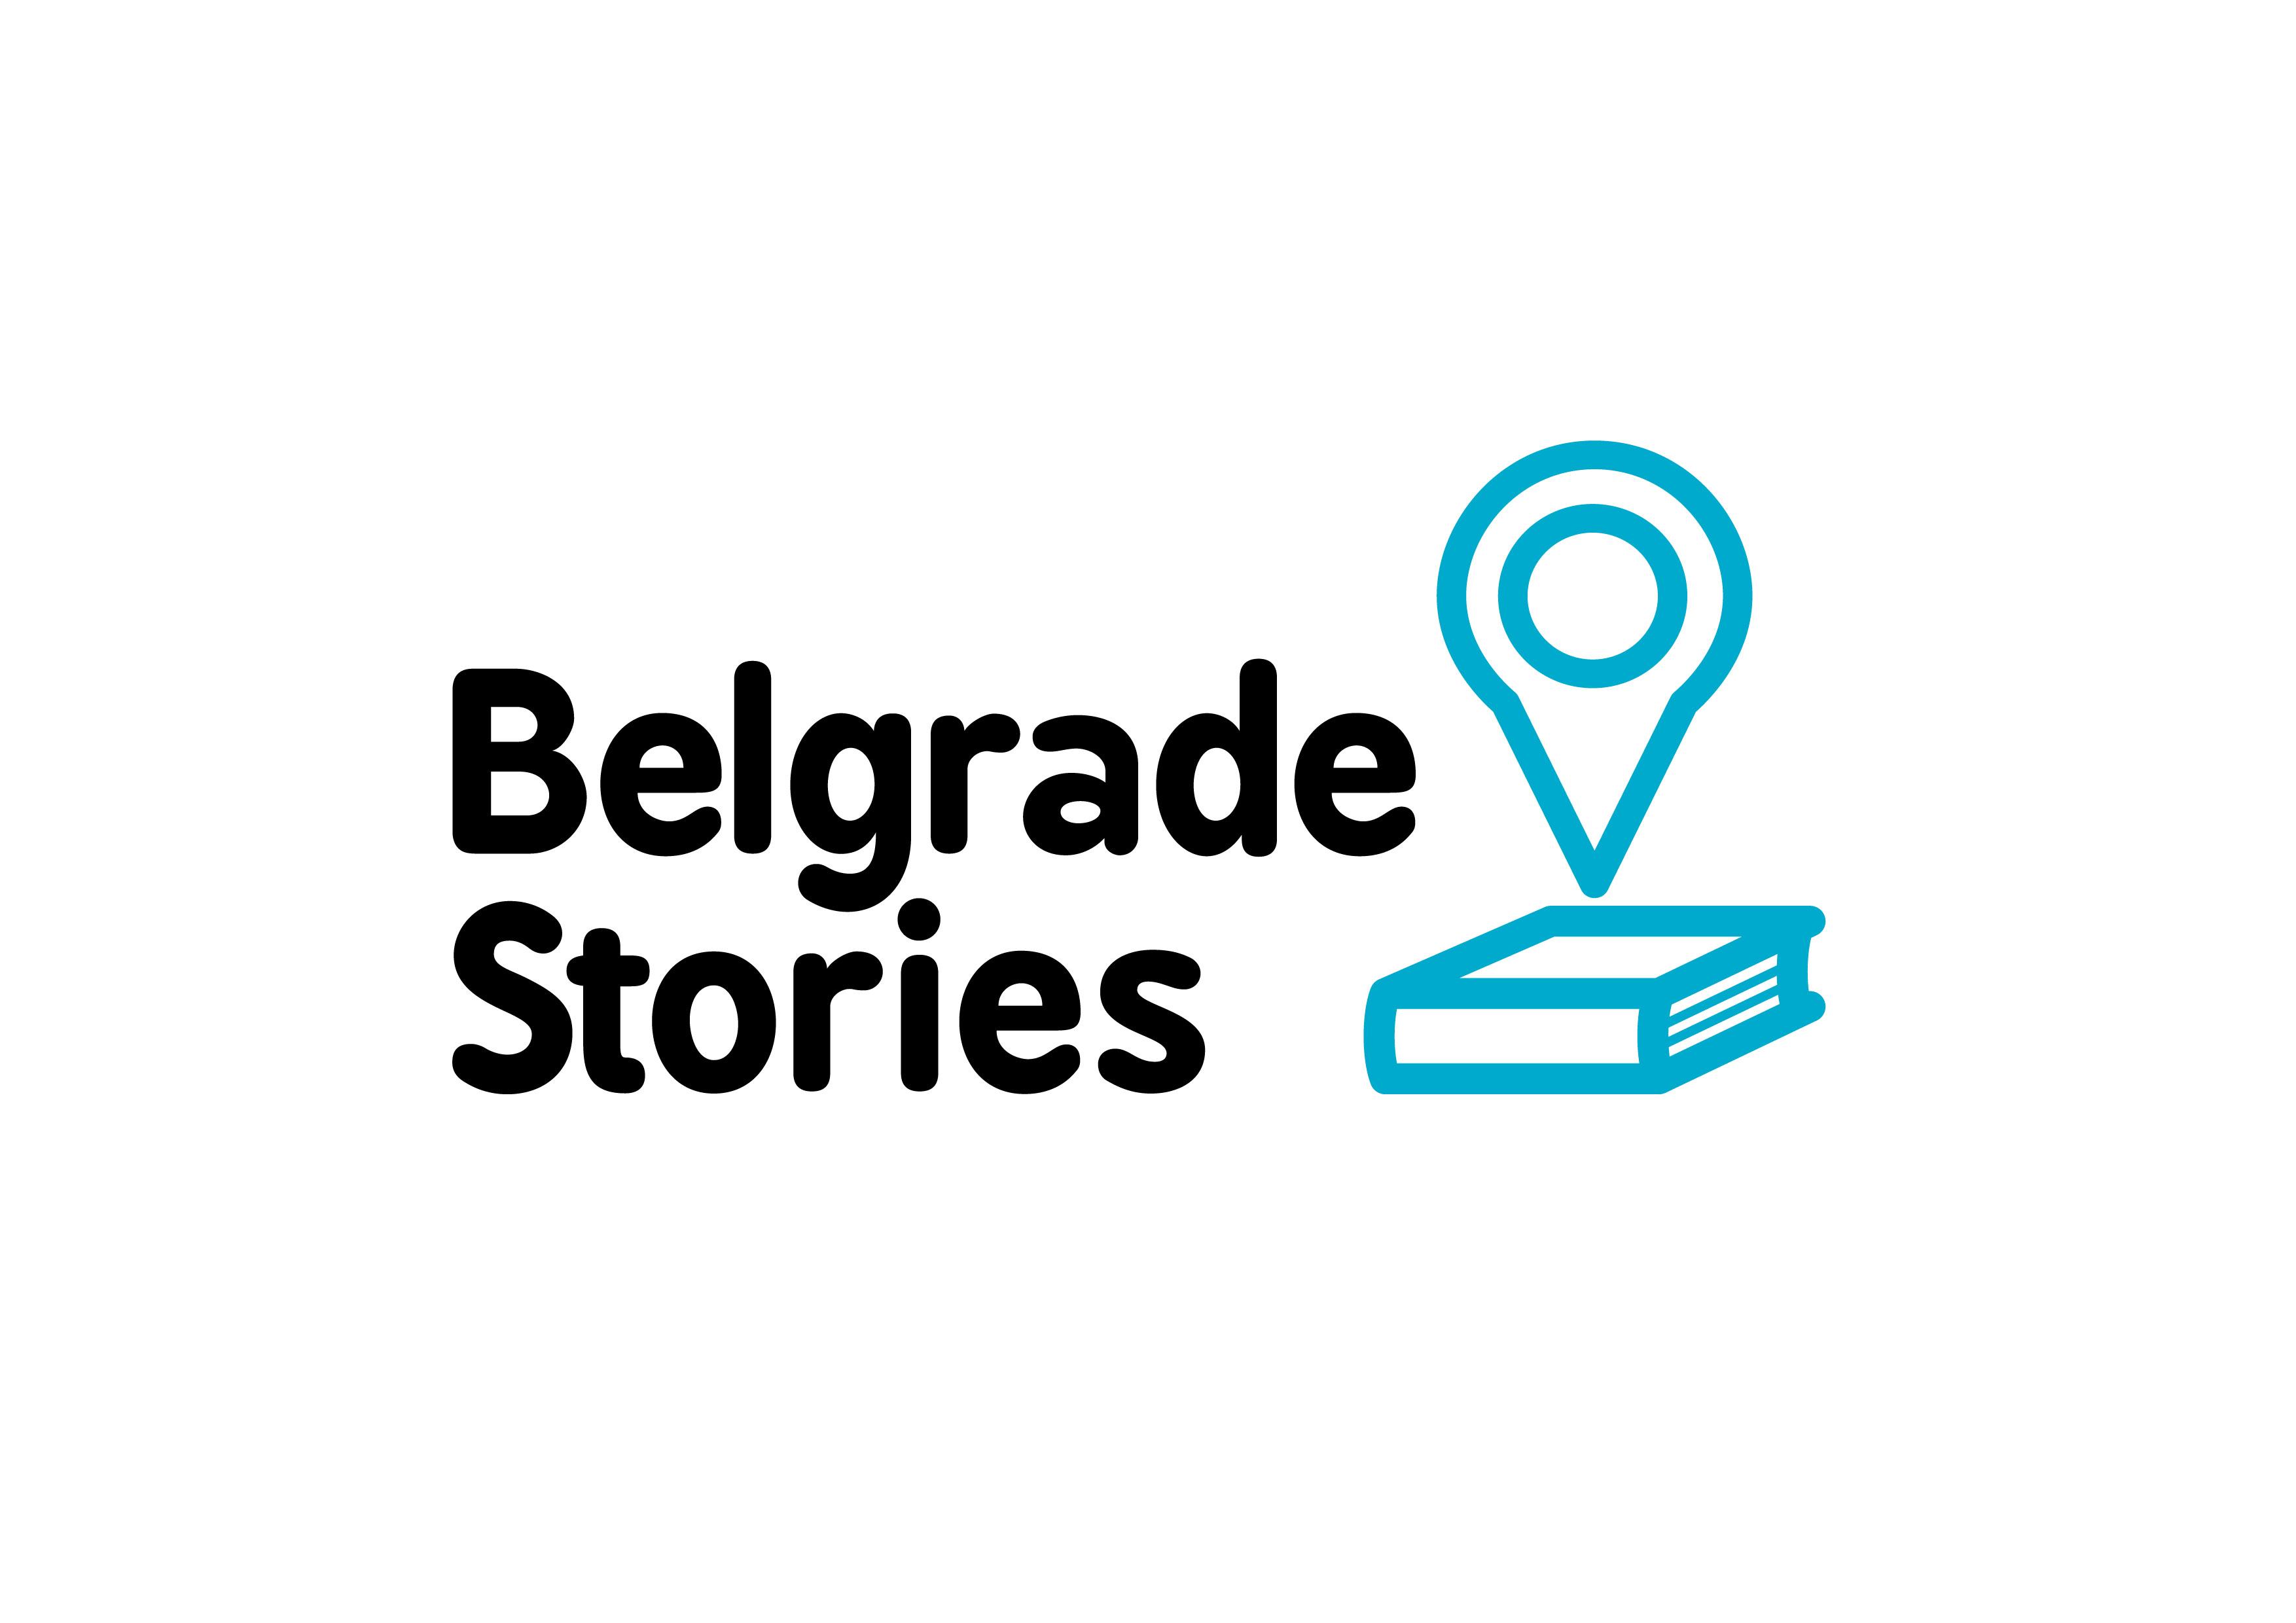 Логотип для агентства городских туров в Белграде фото f_3765893671b32889.jpg